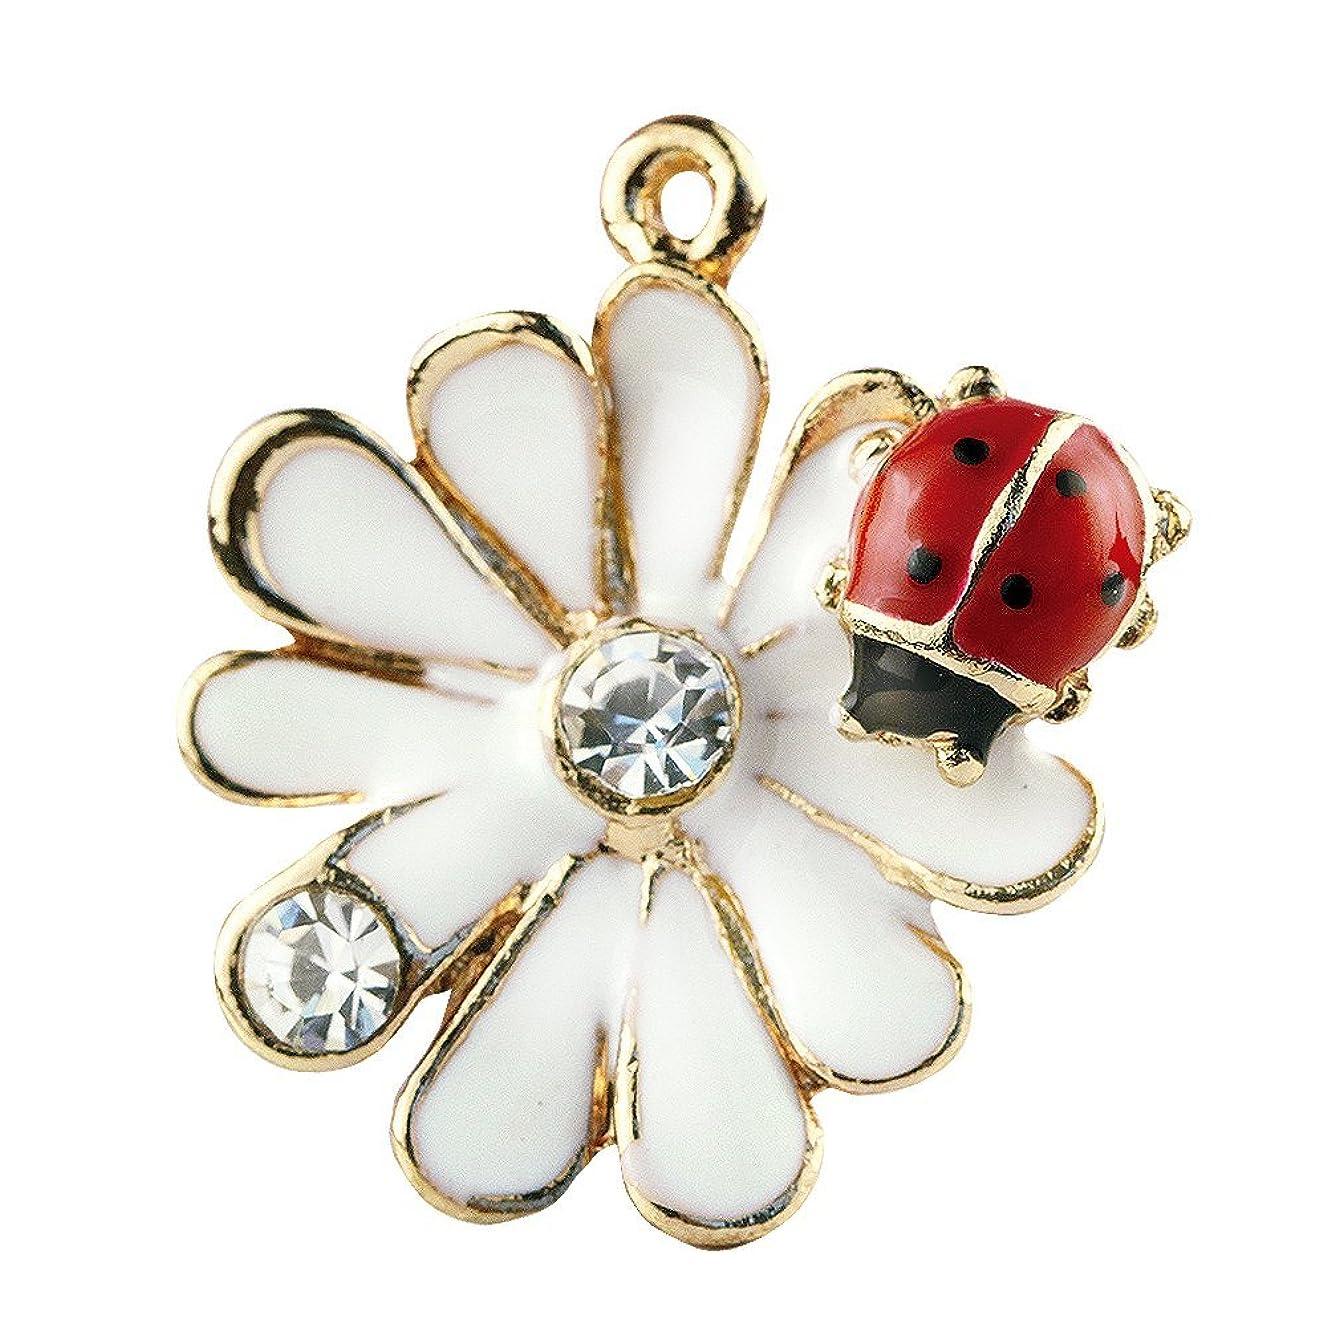 Creative DIY Daisy Ladybug Crystal Charms Pendants Wholesale (Set of 3) MH445